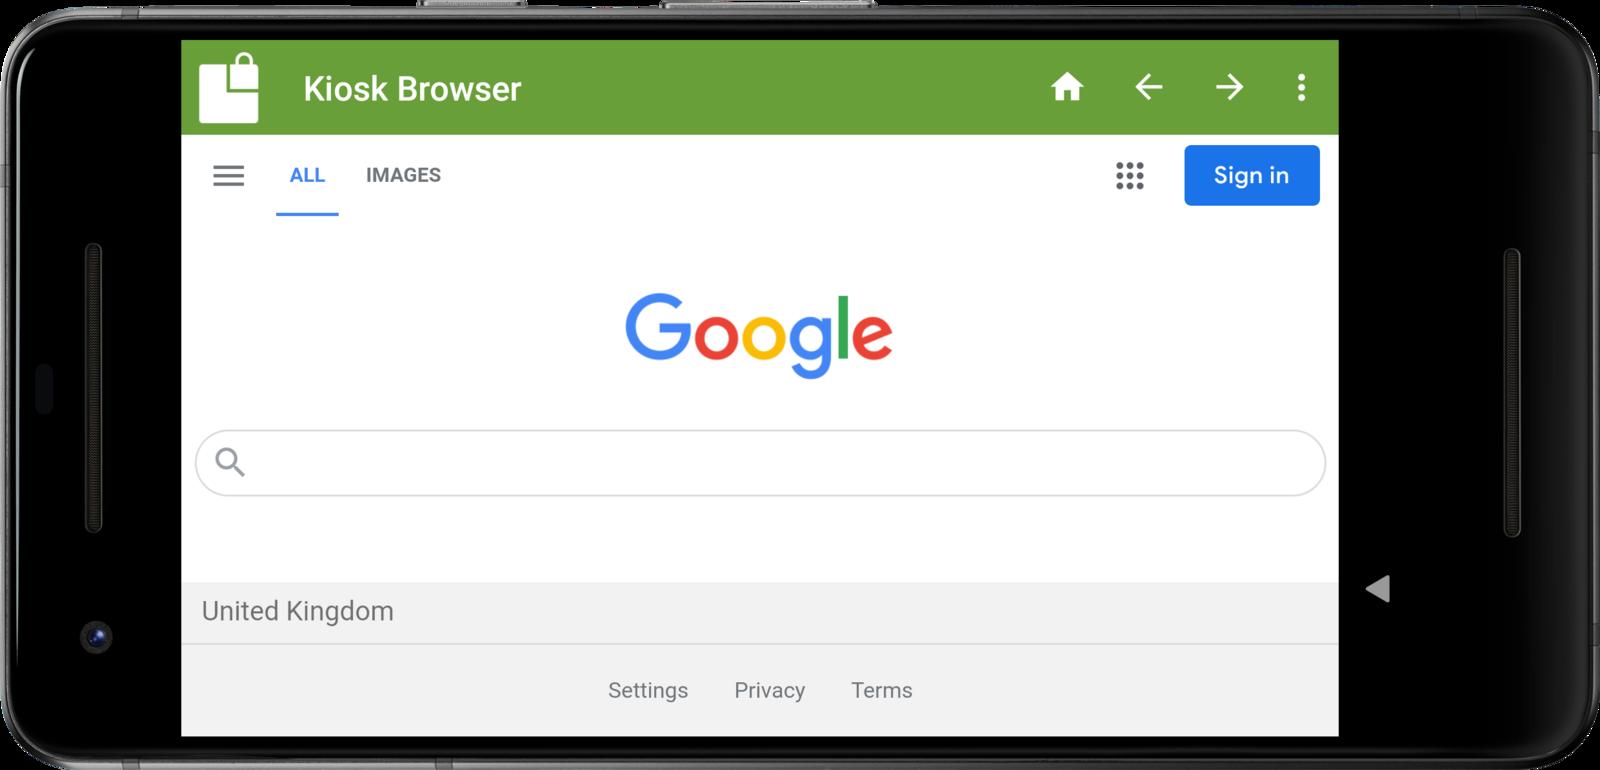 Kiosk Browser